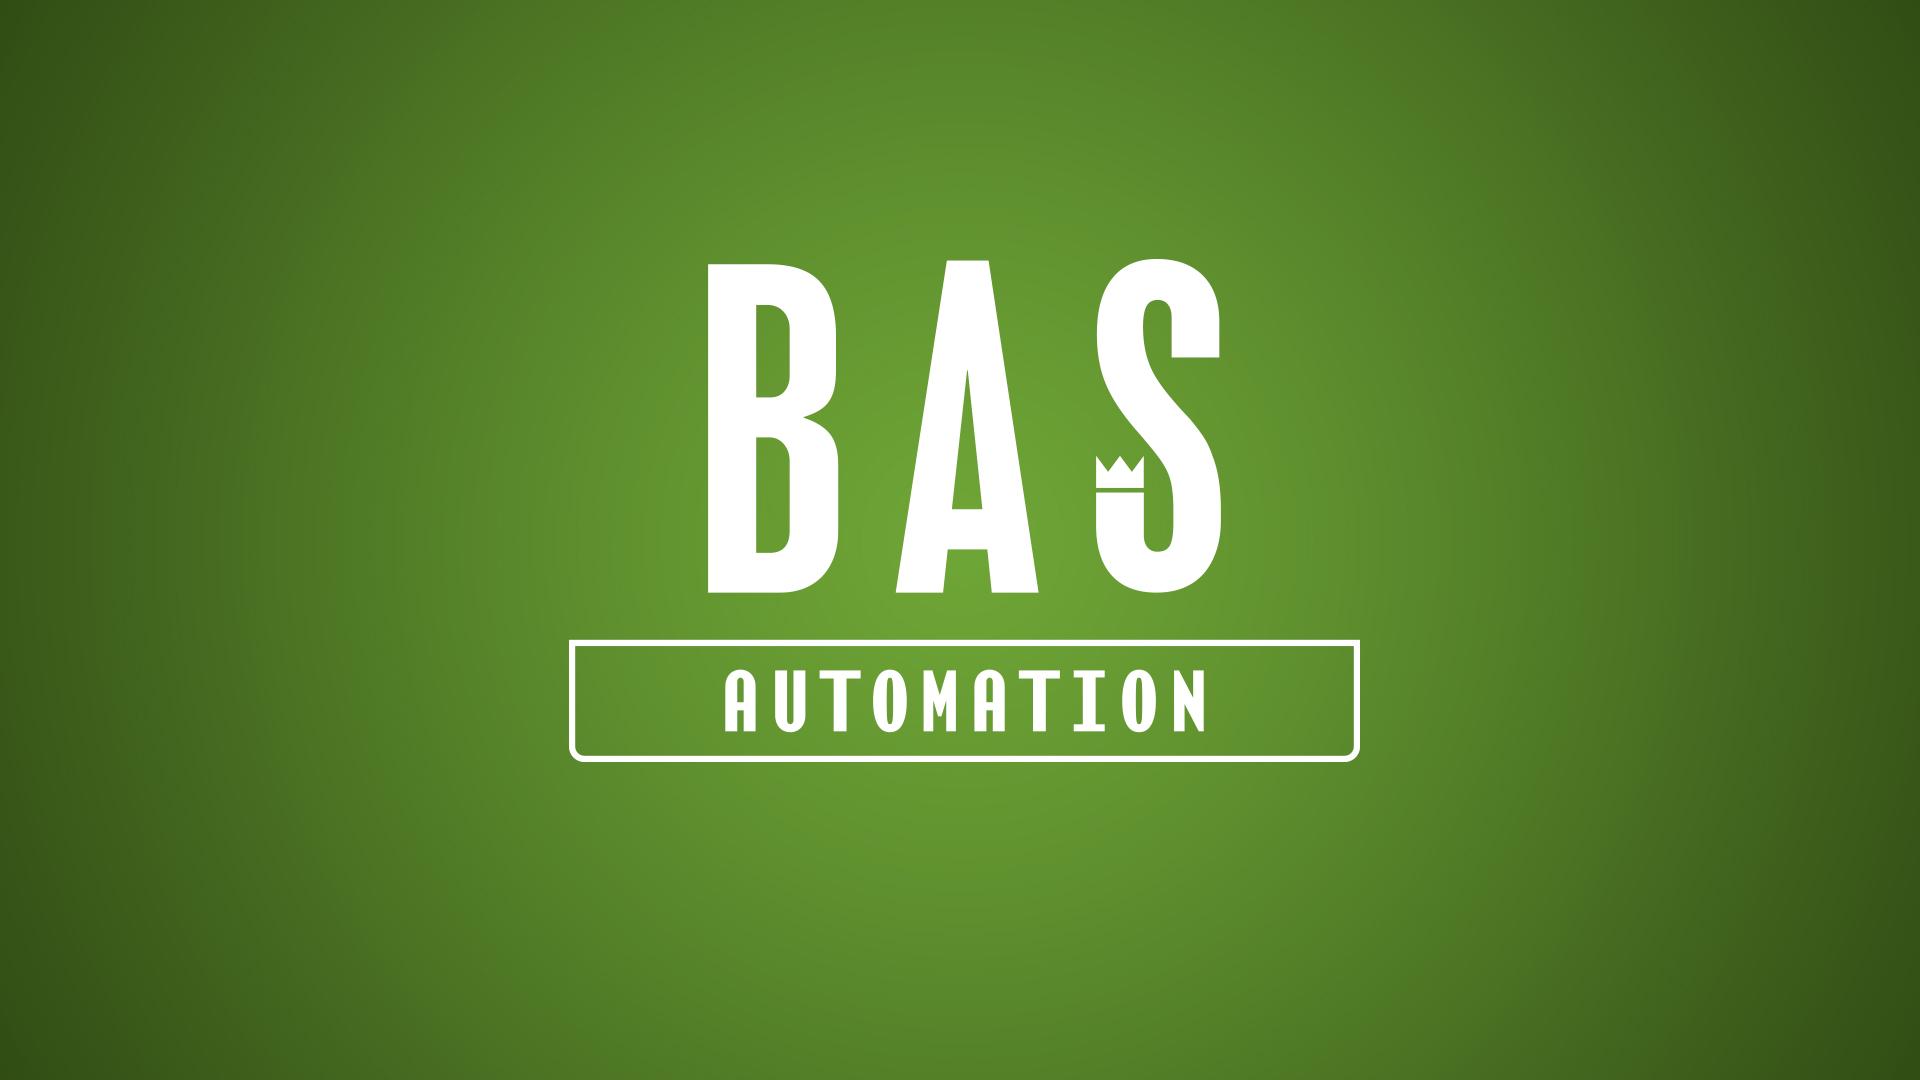 BAS Automation